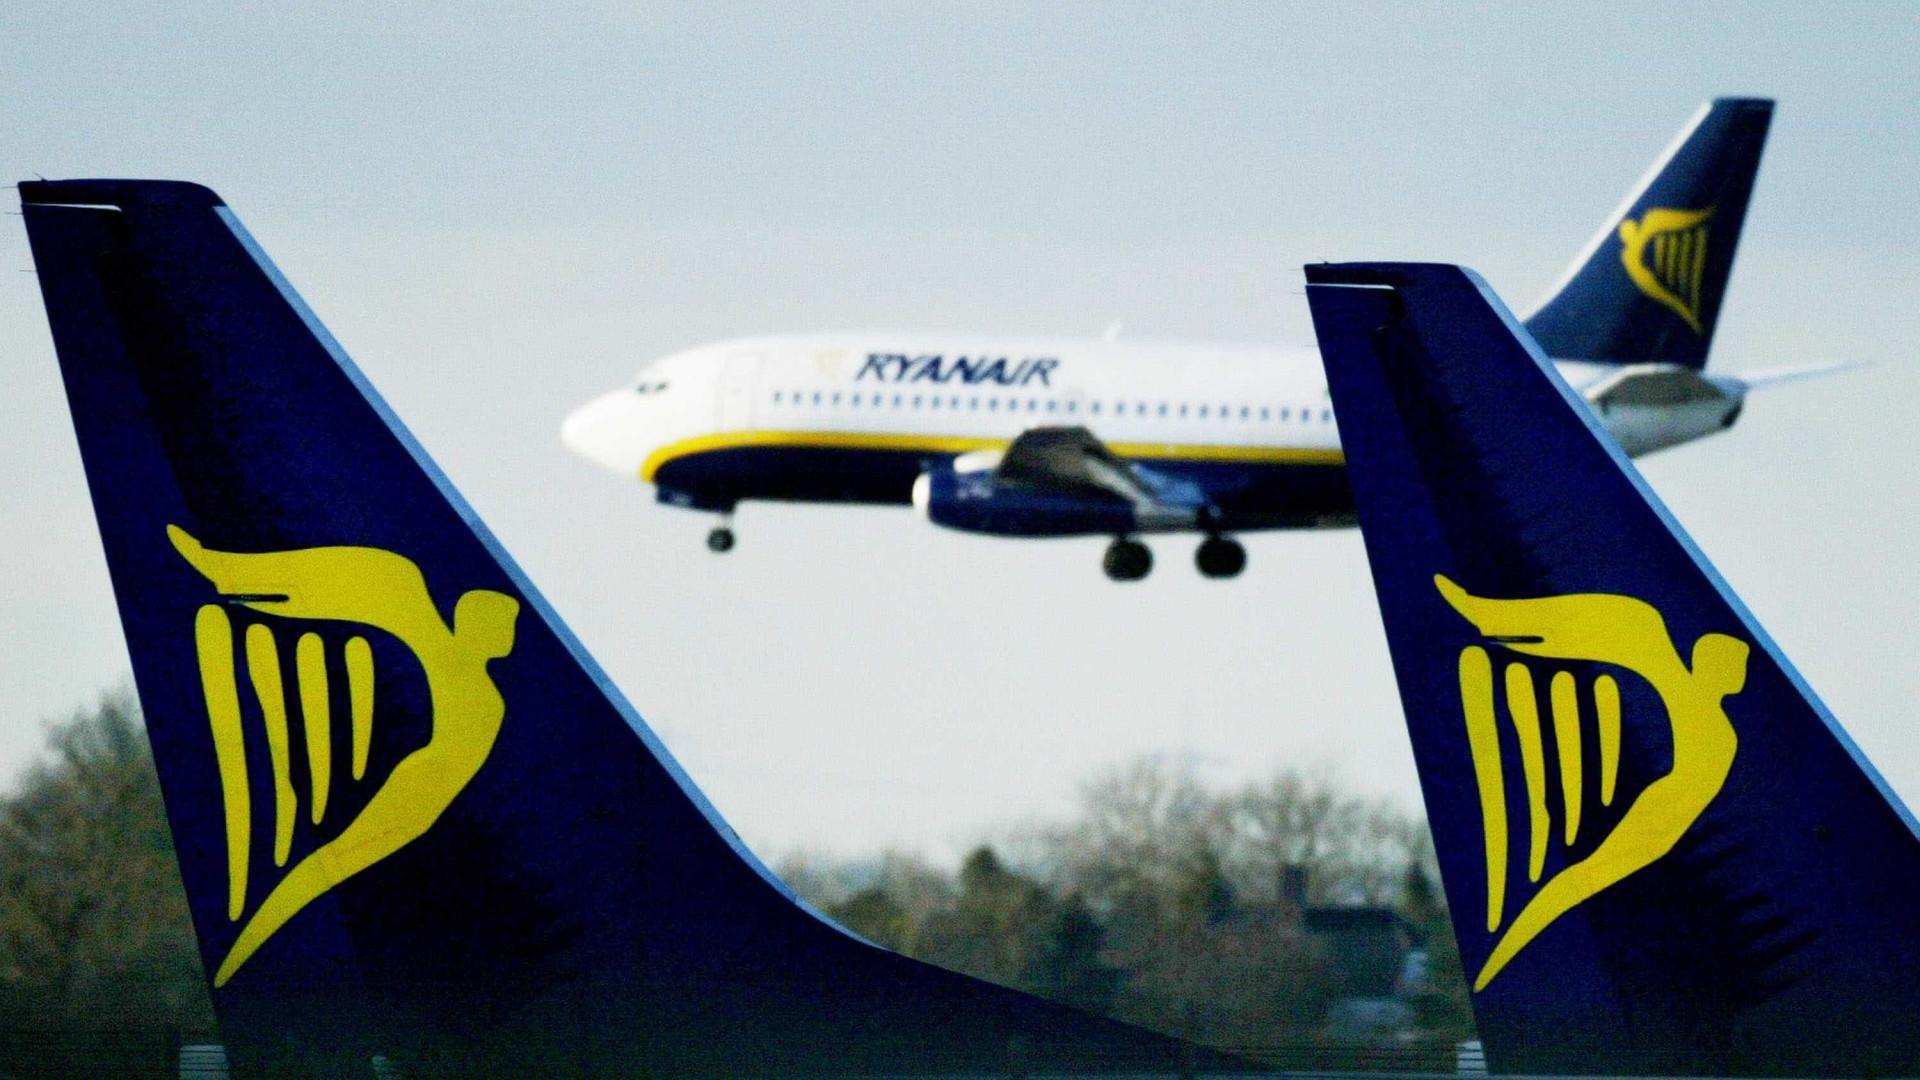 Vai viajar? Ryanair prevê problemas para voos na Páscoa e verão